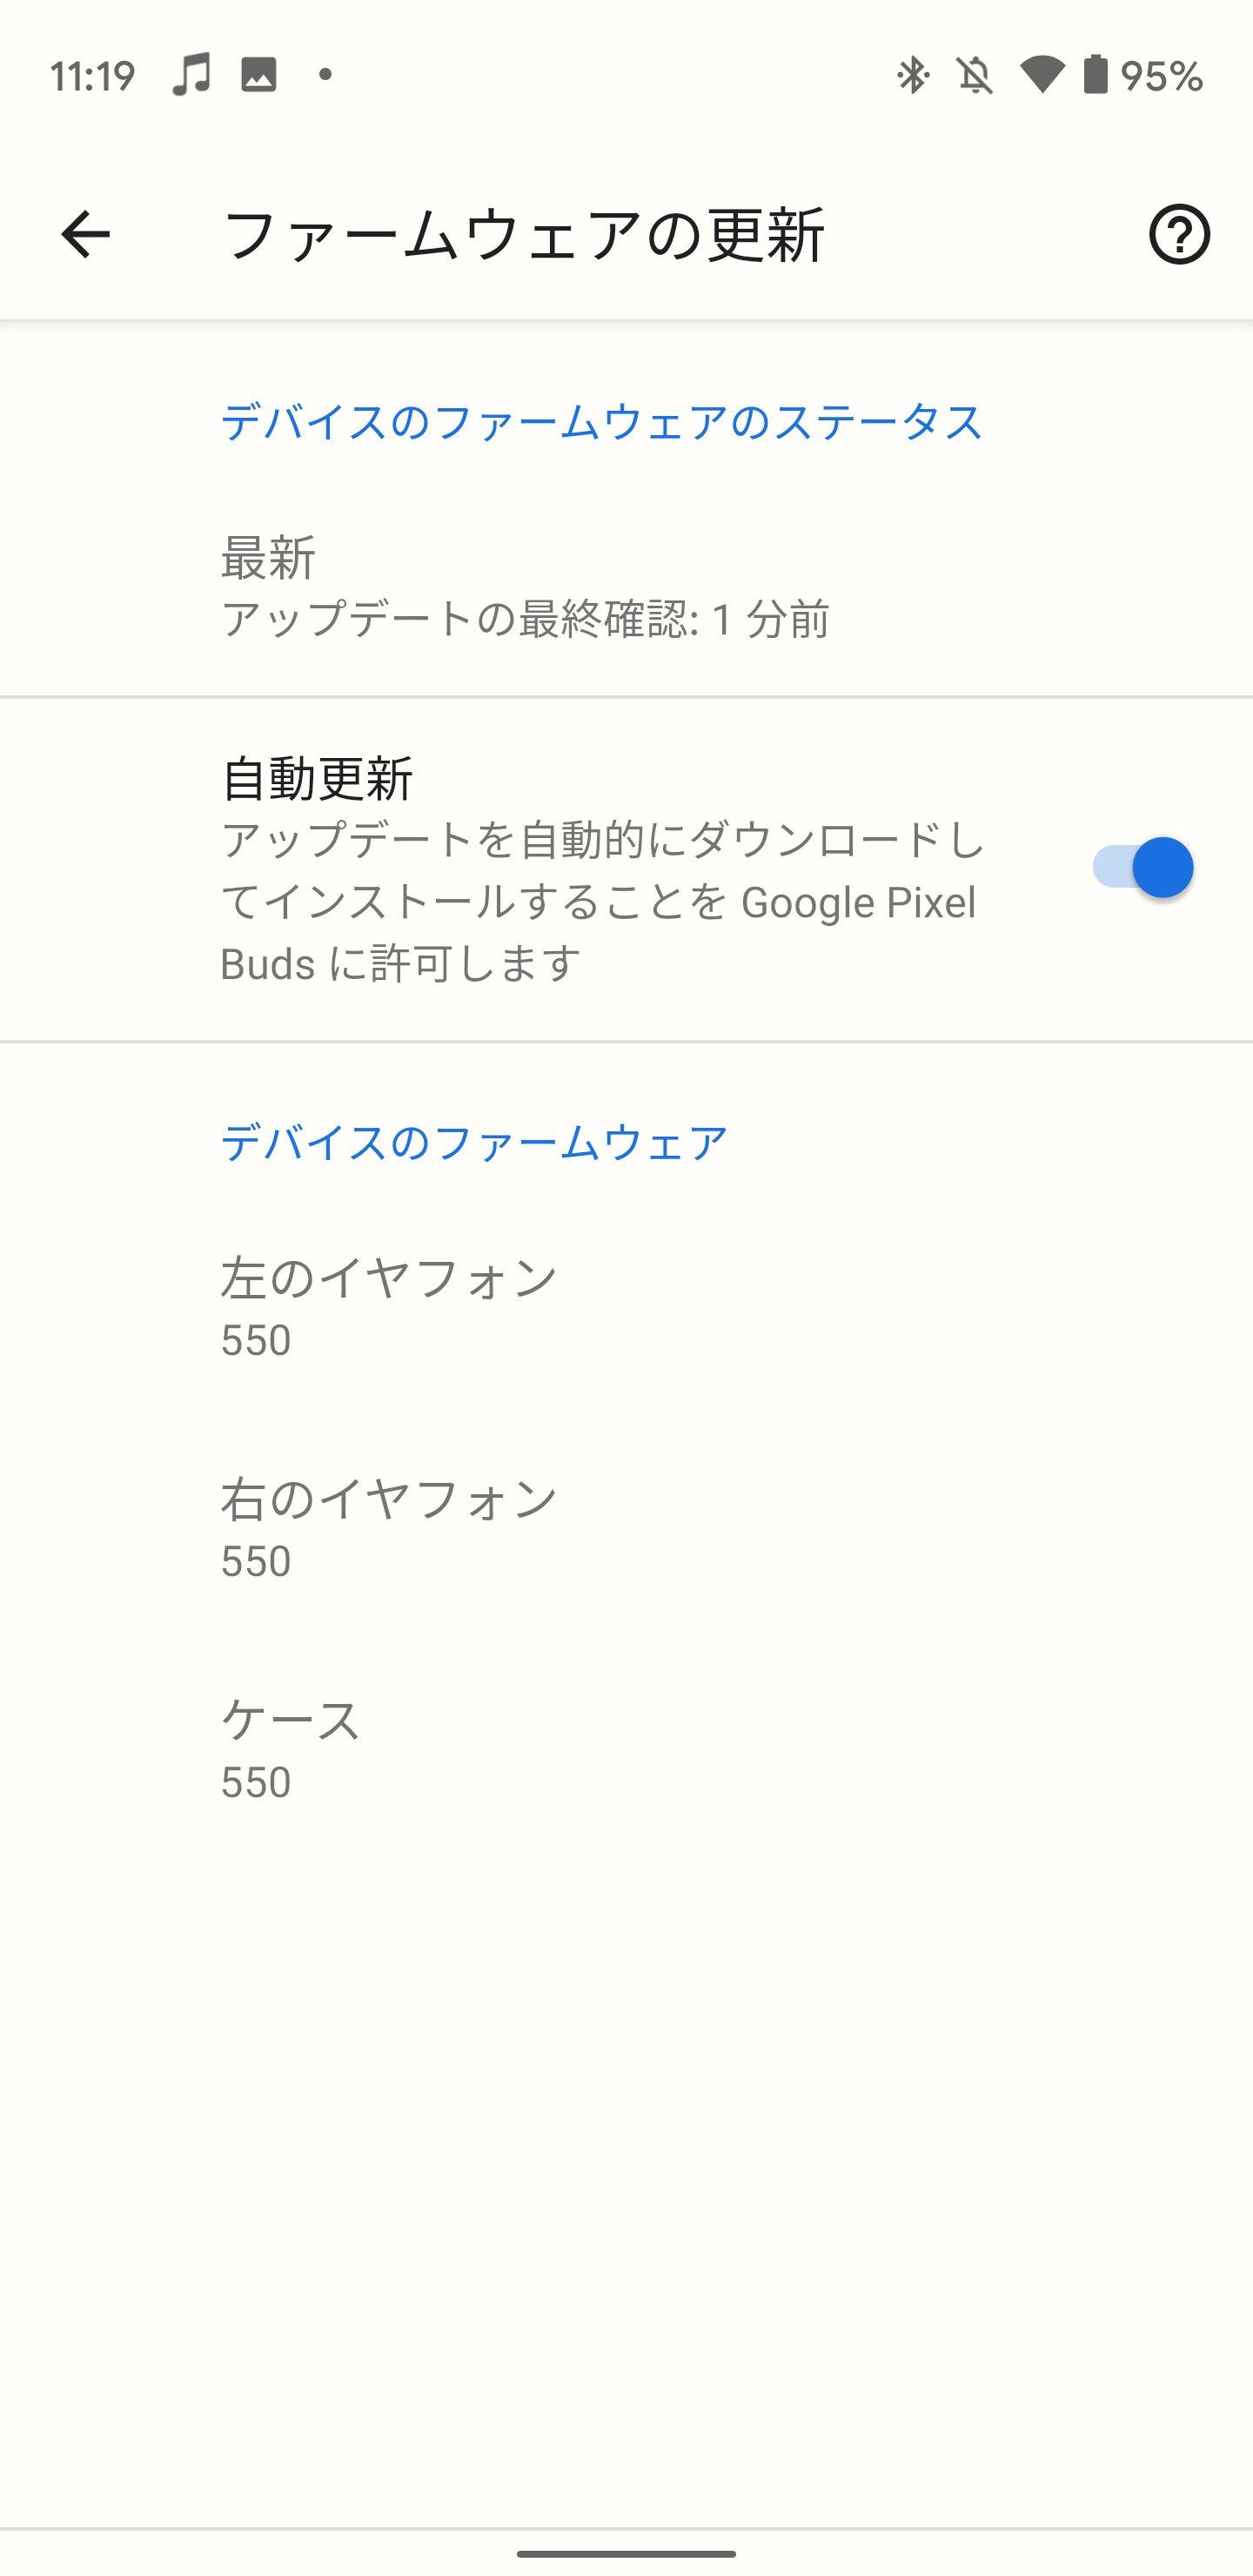 Google Pixel Buds Settings Panel